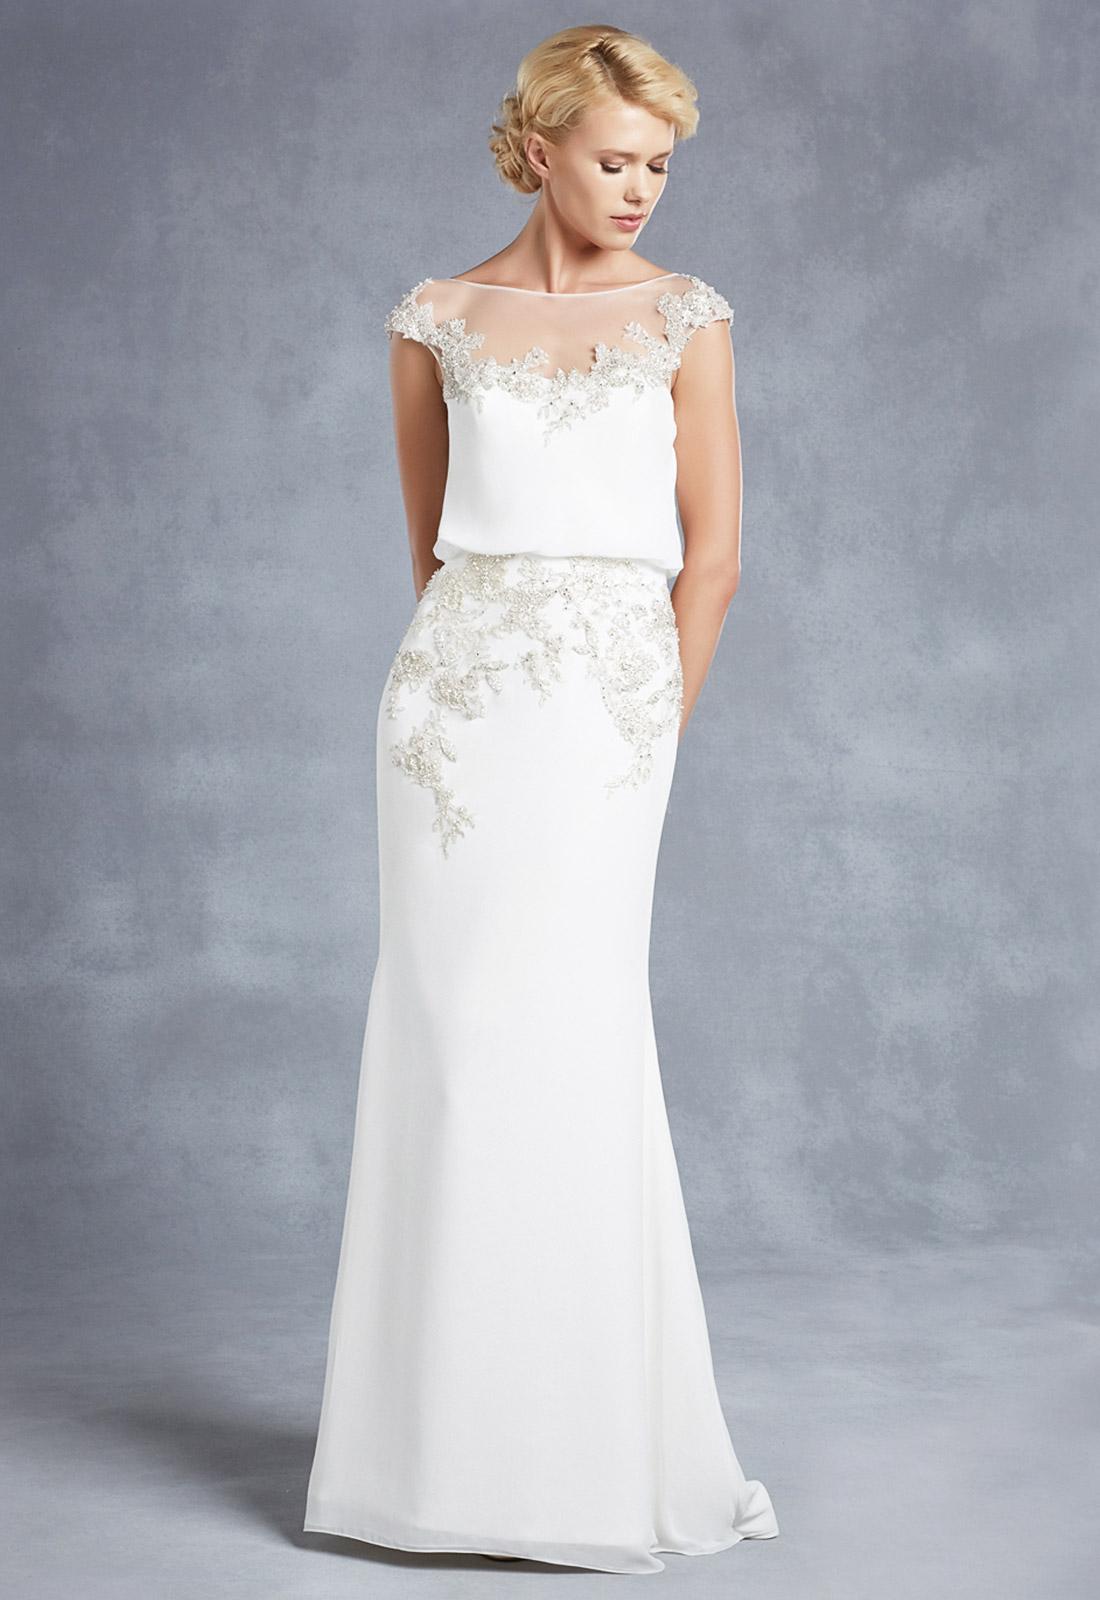 Roberta\'s Bridal | Wedding, Prom & Bridal Dresses, Staffordshire